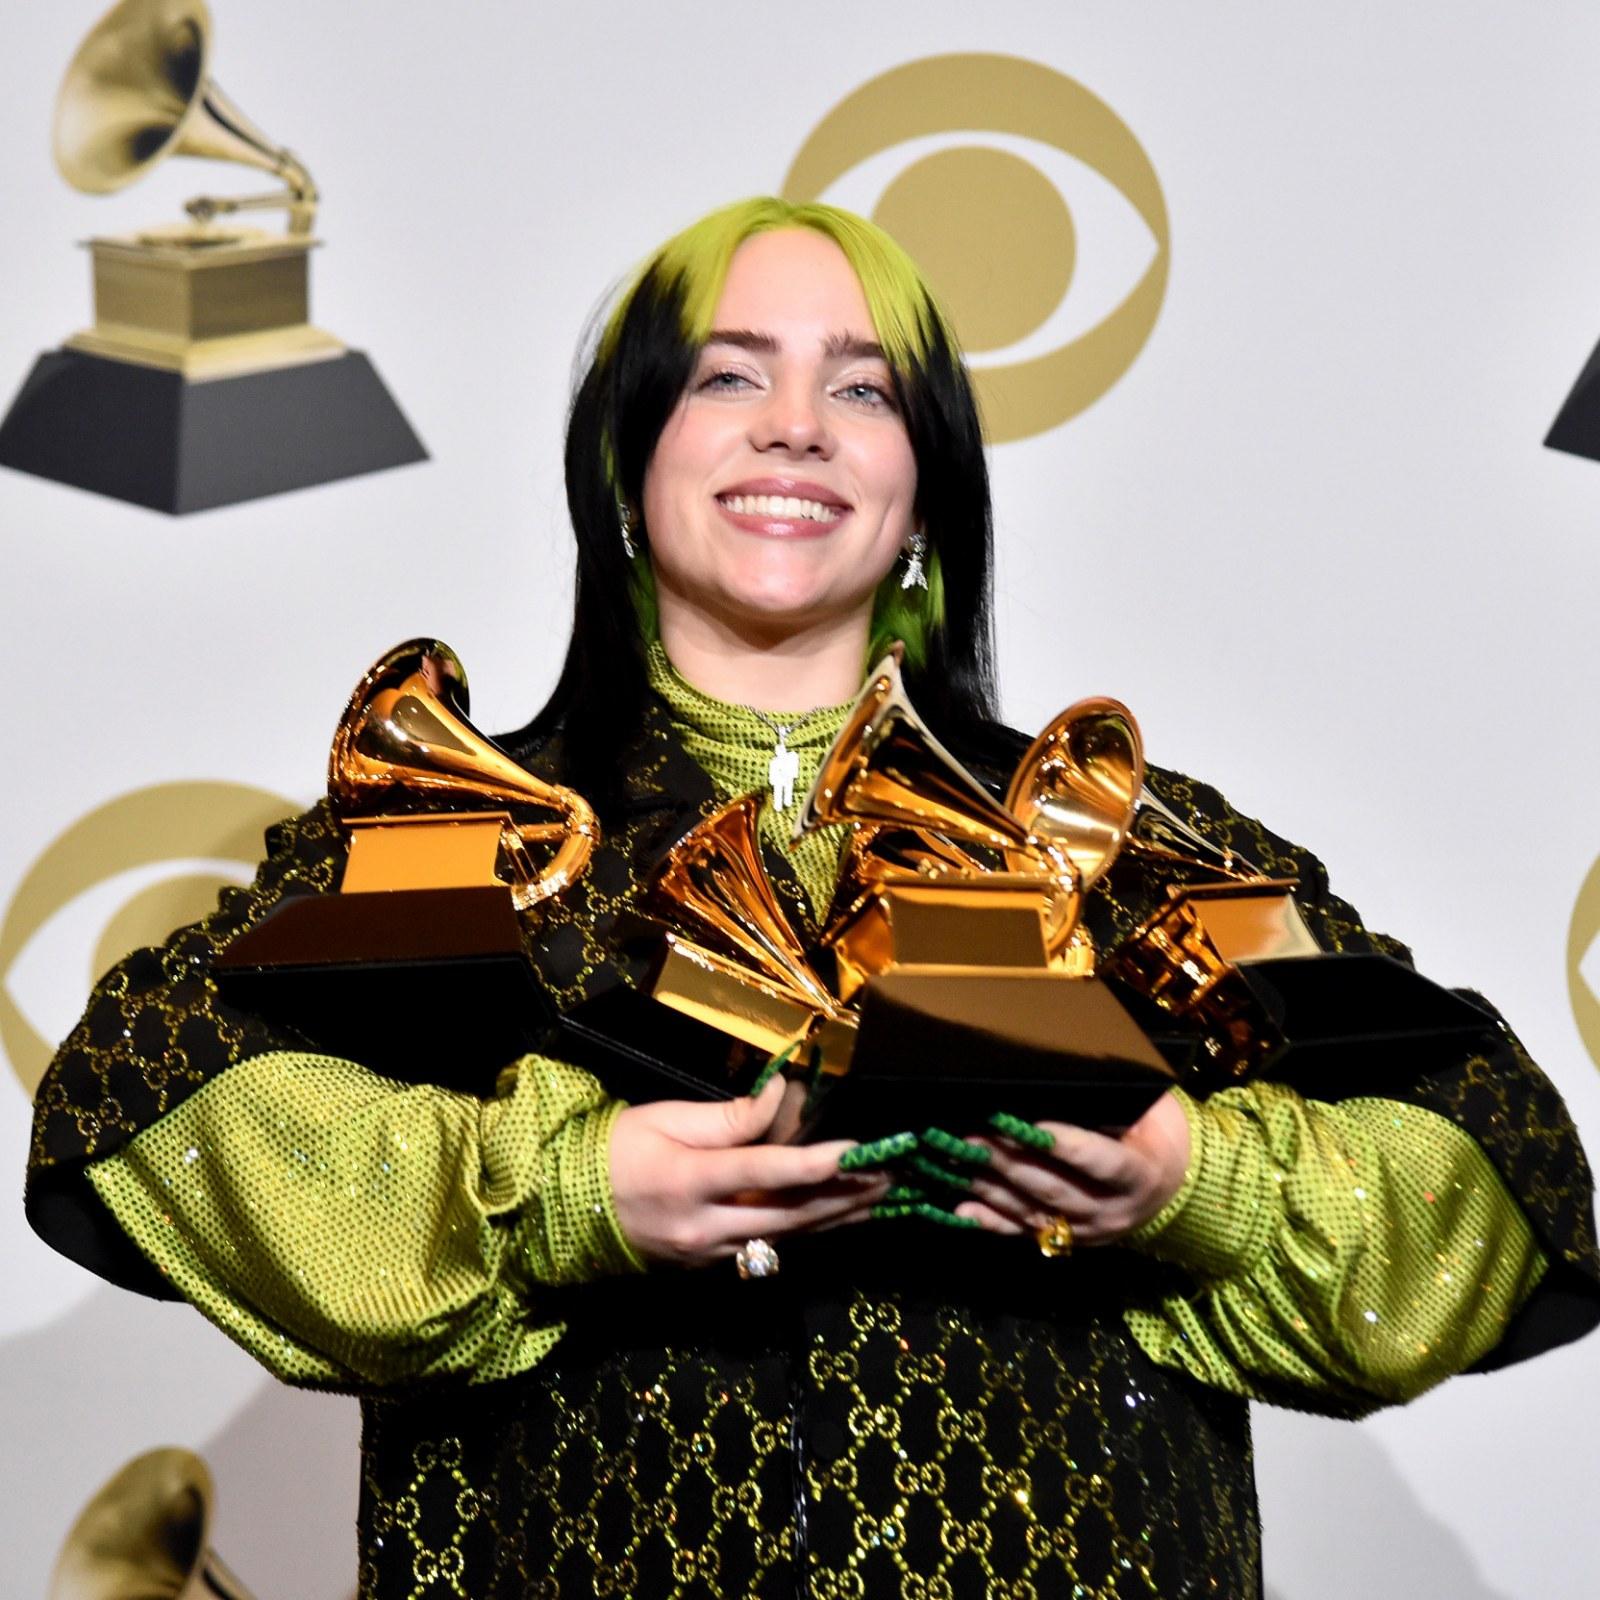 billie-eilish-grammys-2020-awards-big-fo